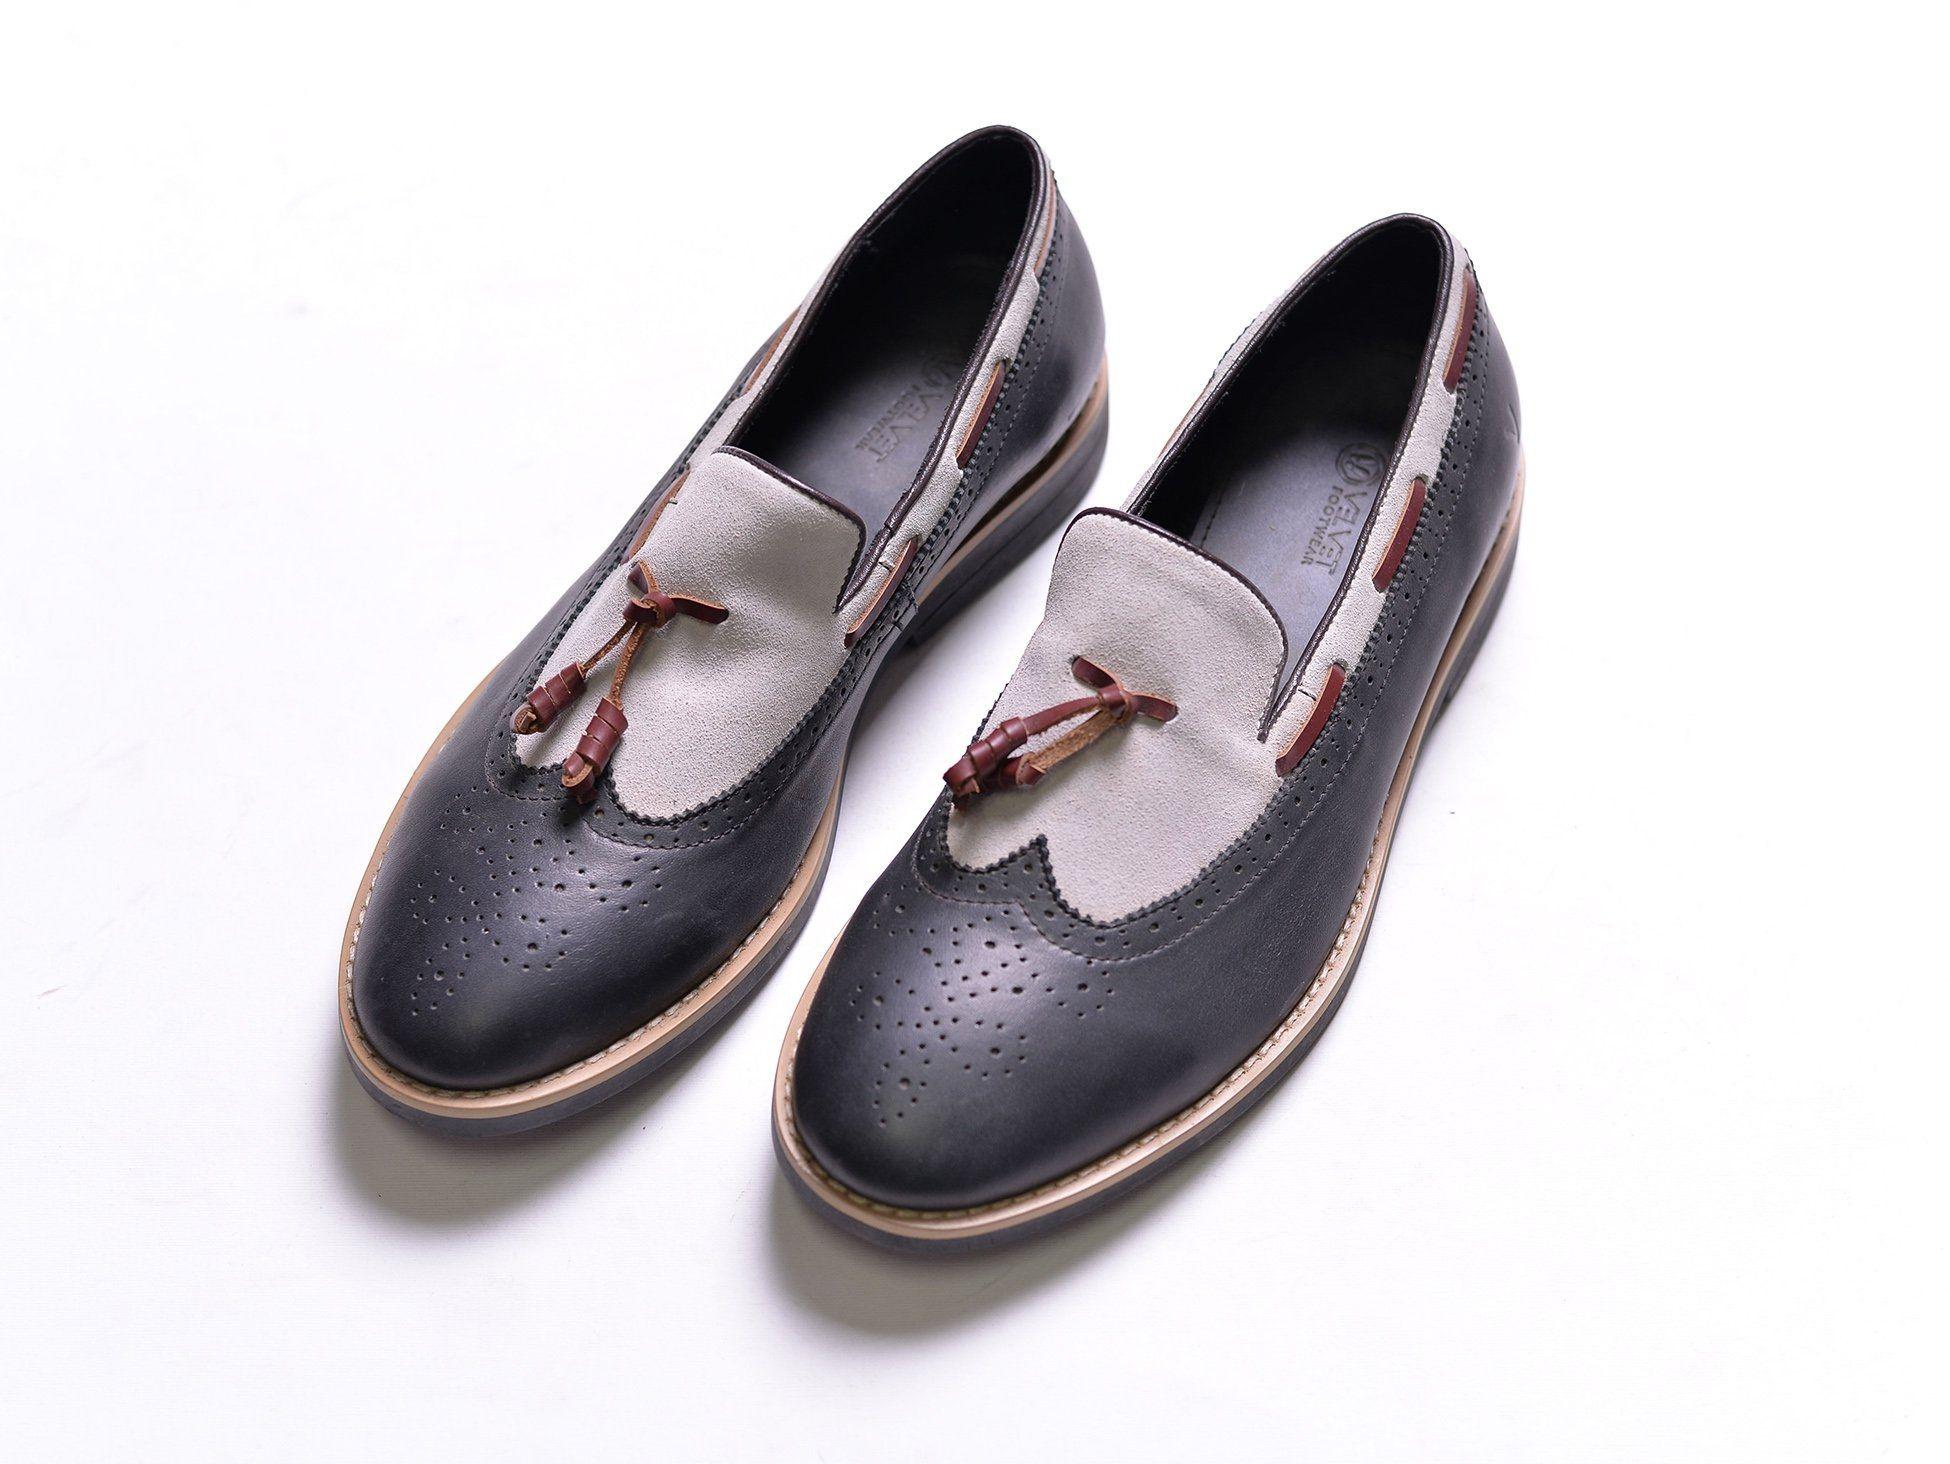 85f91f952 سعر HSK ROBINSON Casuel Shoes فى مصر   جوميا   أحذية   كان بكام